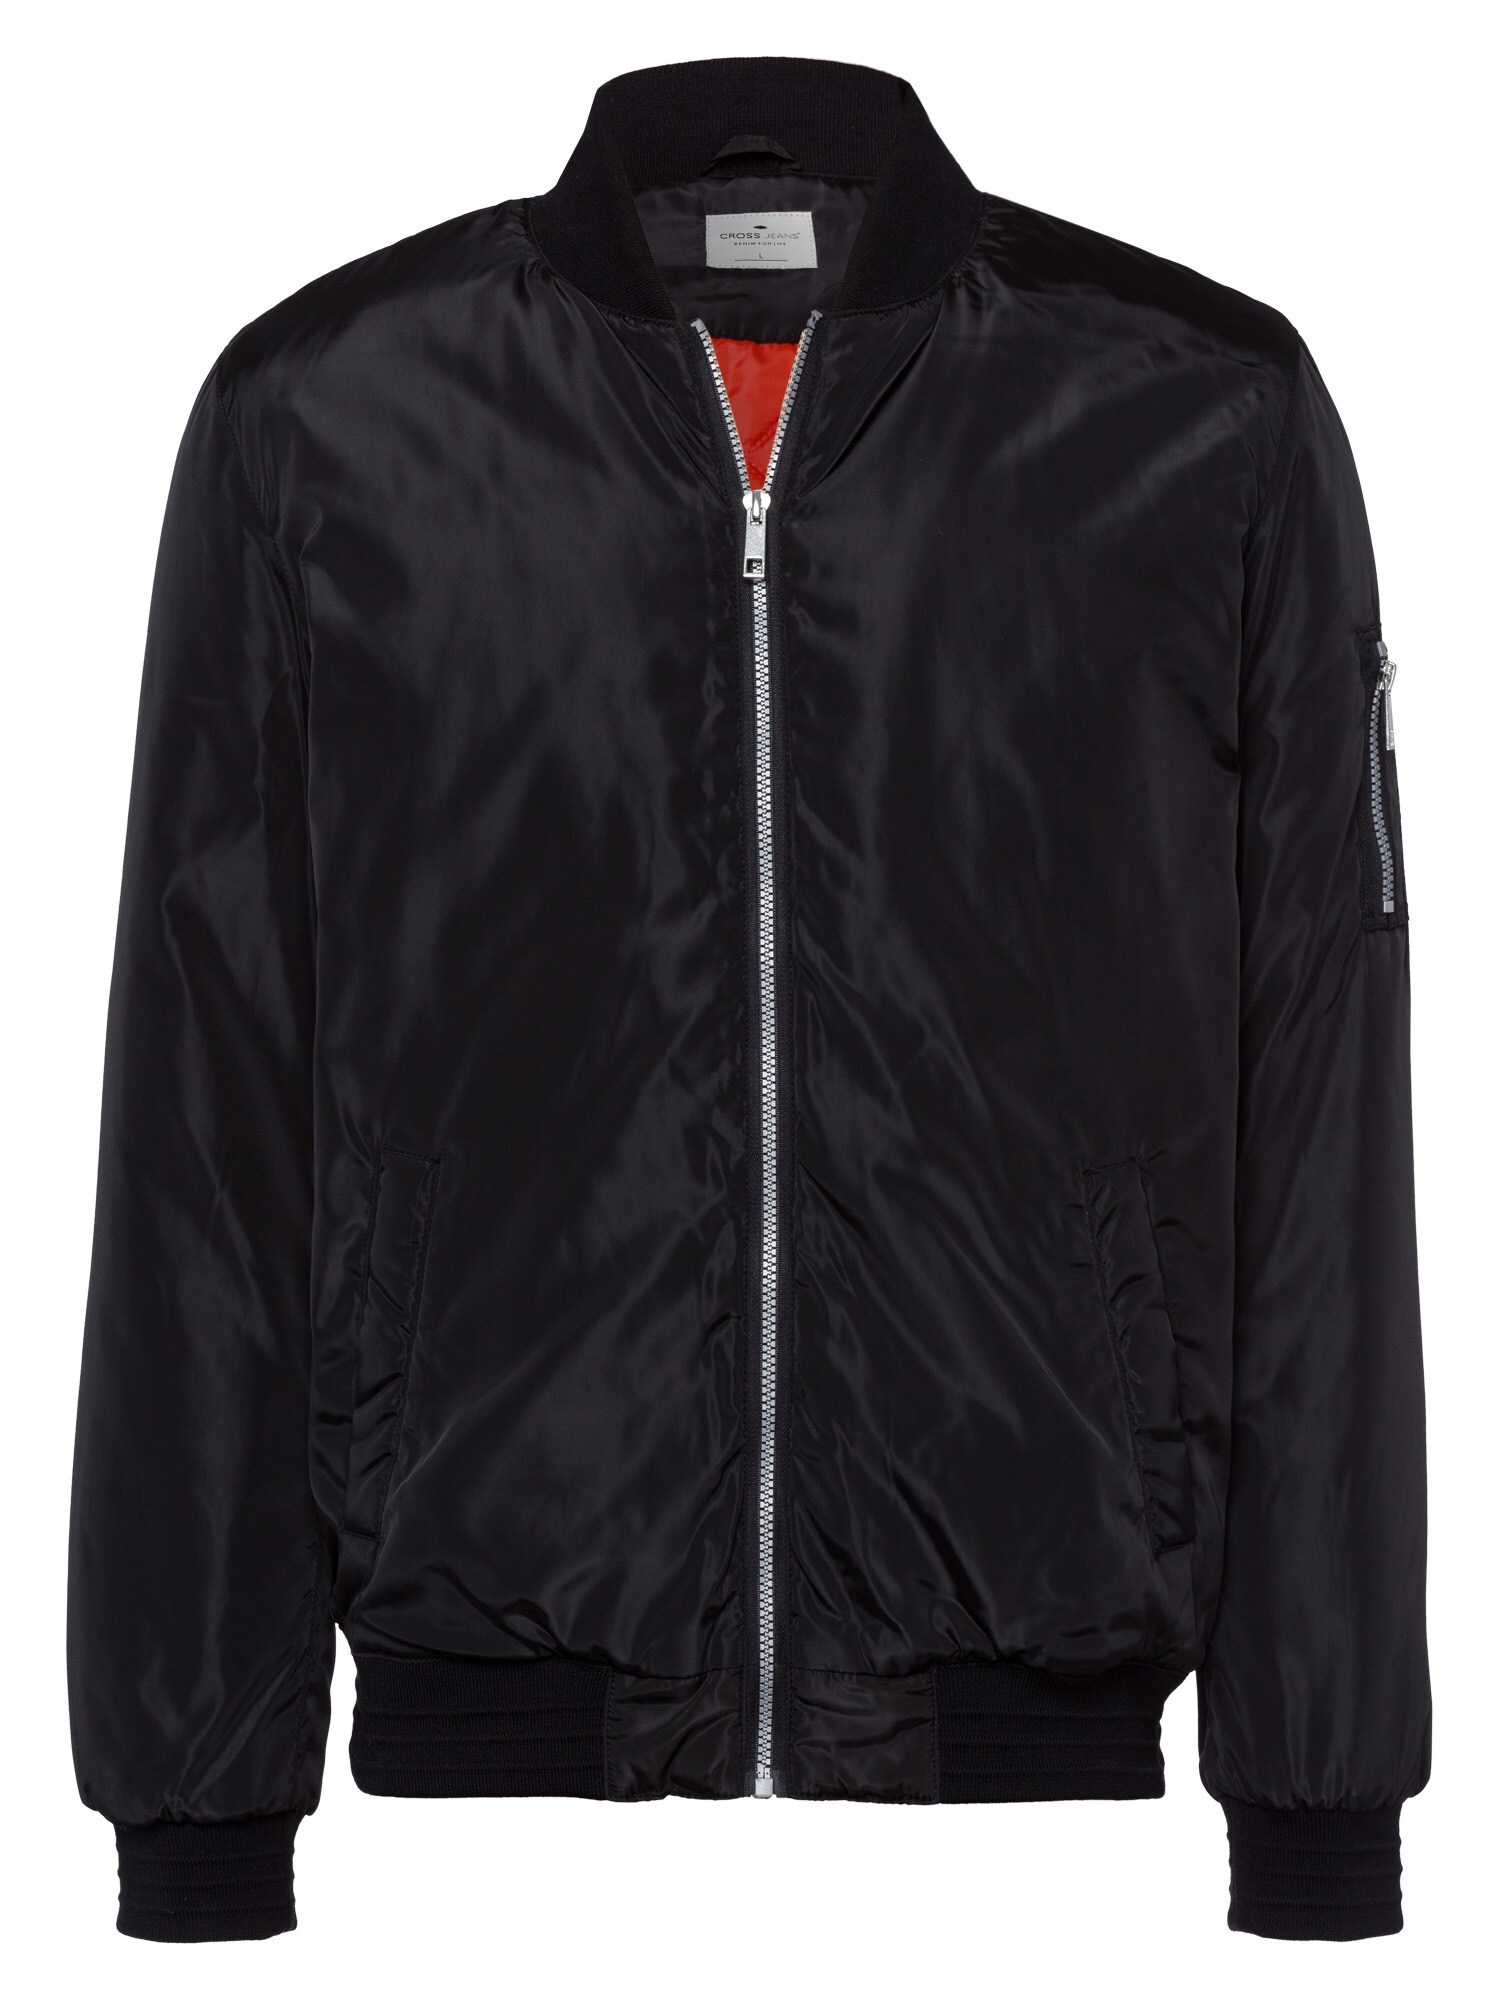 Outdoorjacken '40211' | Sportbekleidung > Sportjacken | Schwarz | cross jeans